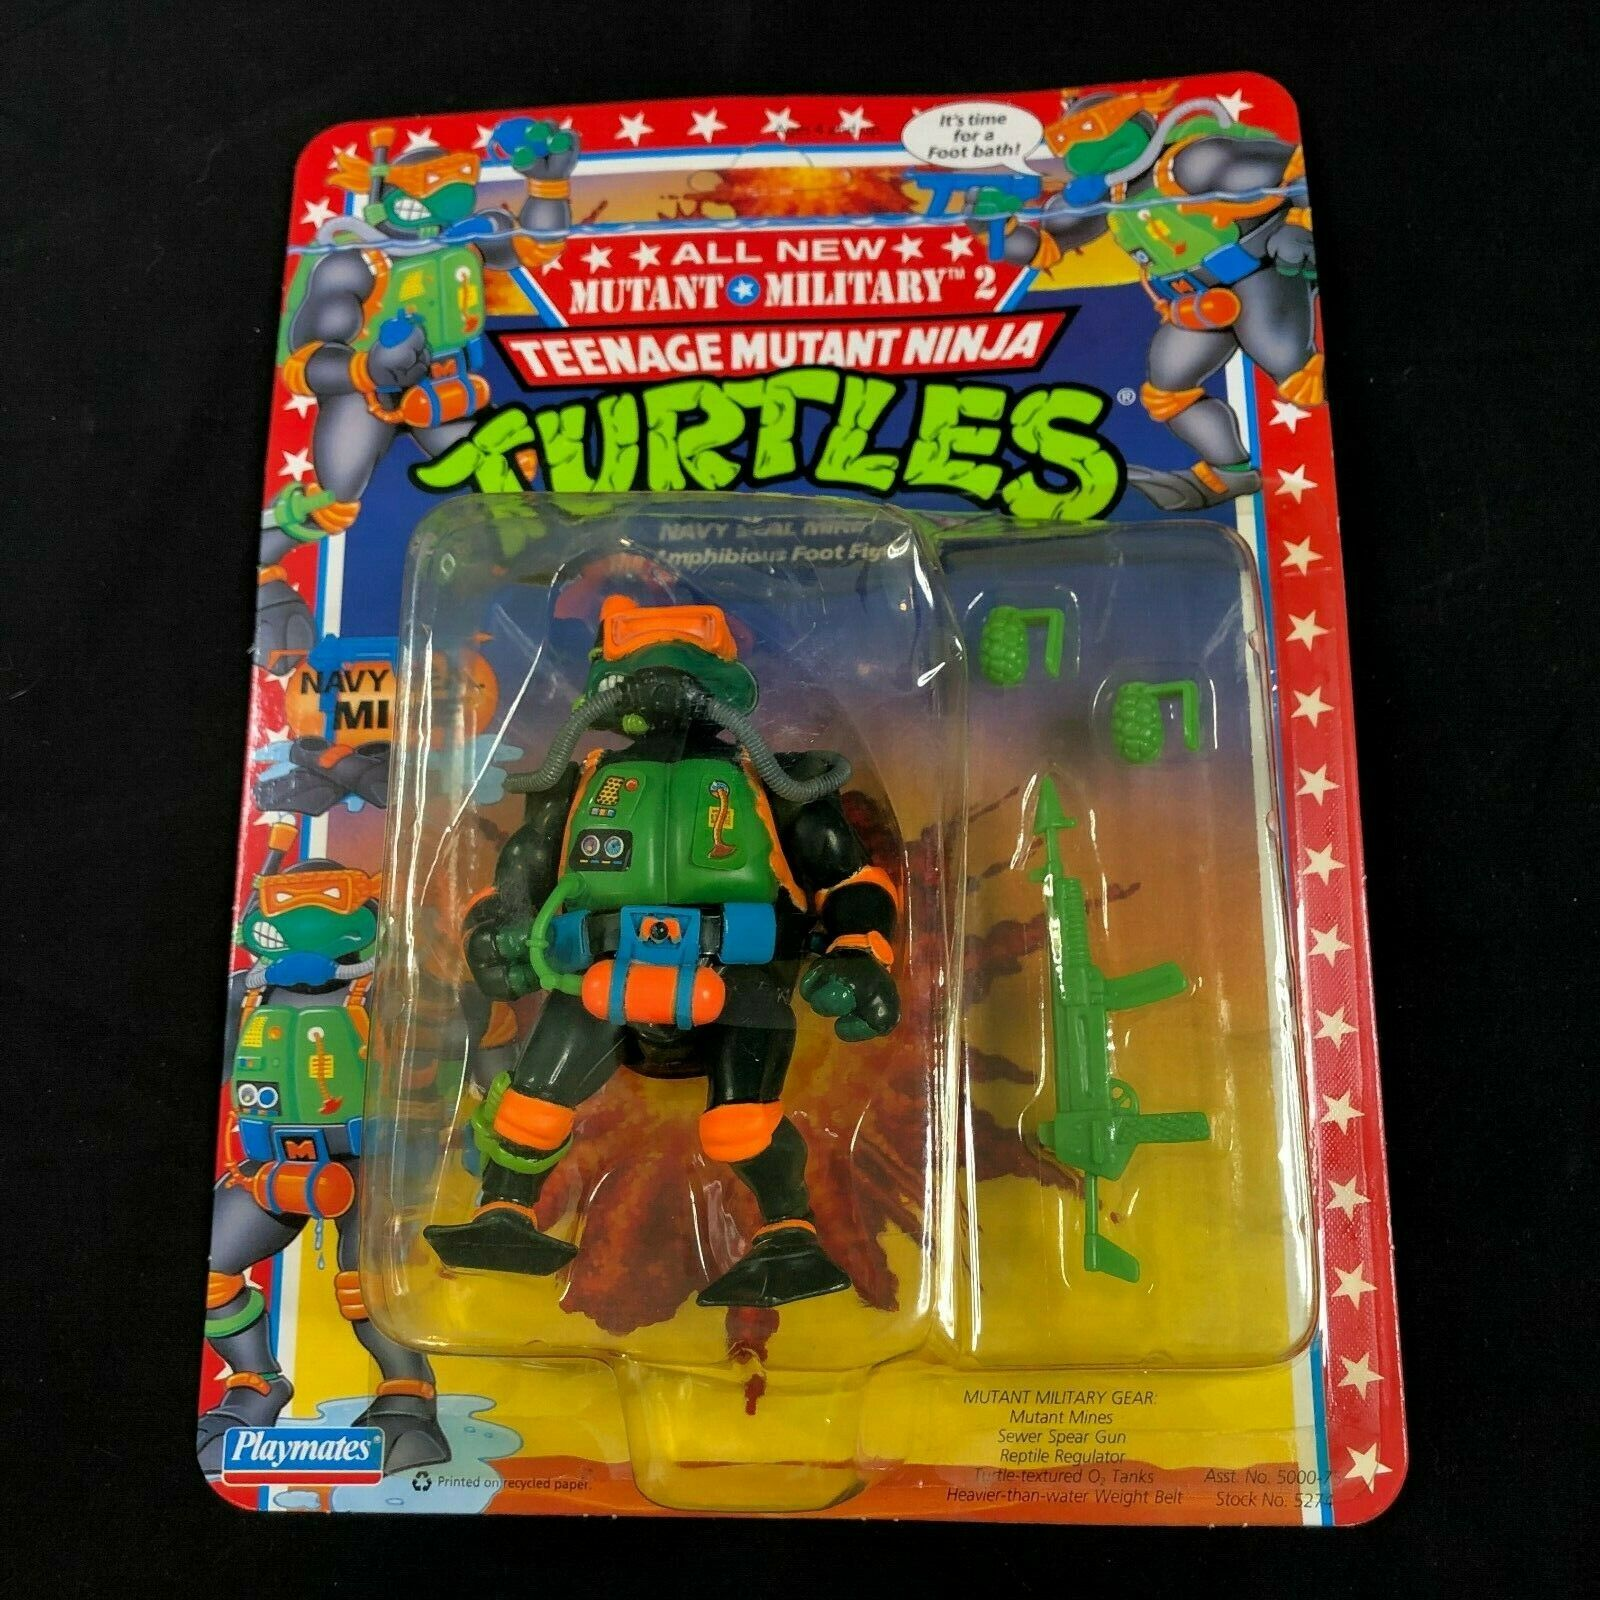 Vintage 1992 Teenage Mutant Ninja Turtles TEENAGE MUTANT NINJA TURTLES US Navy  Navy Seal Mike  raro duro encontrar la menta en tarjeta